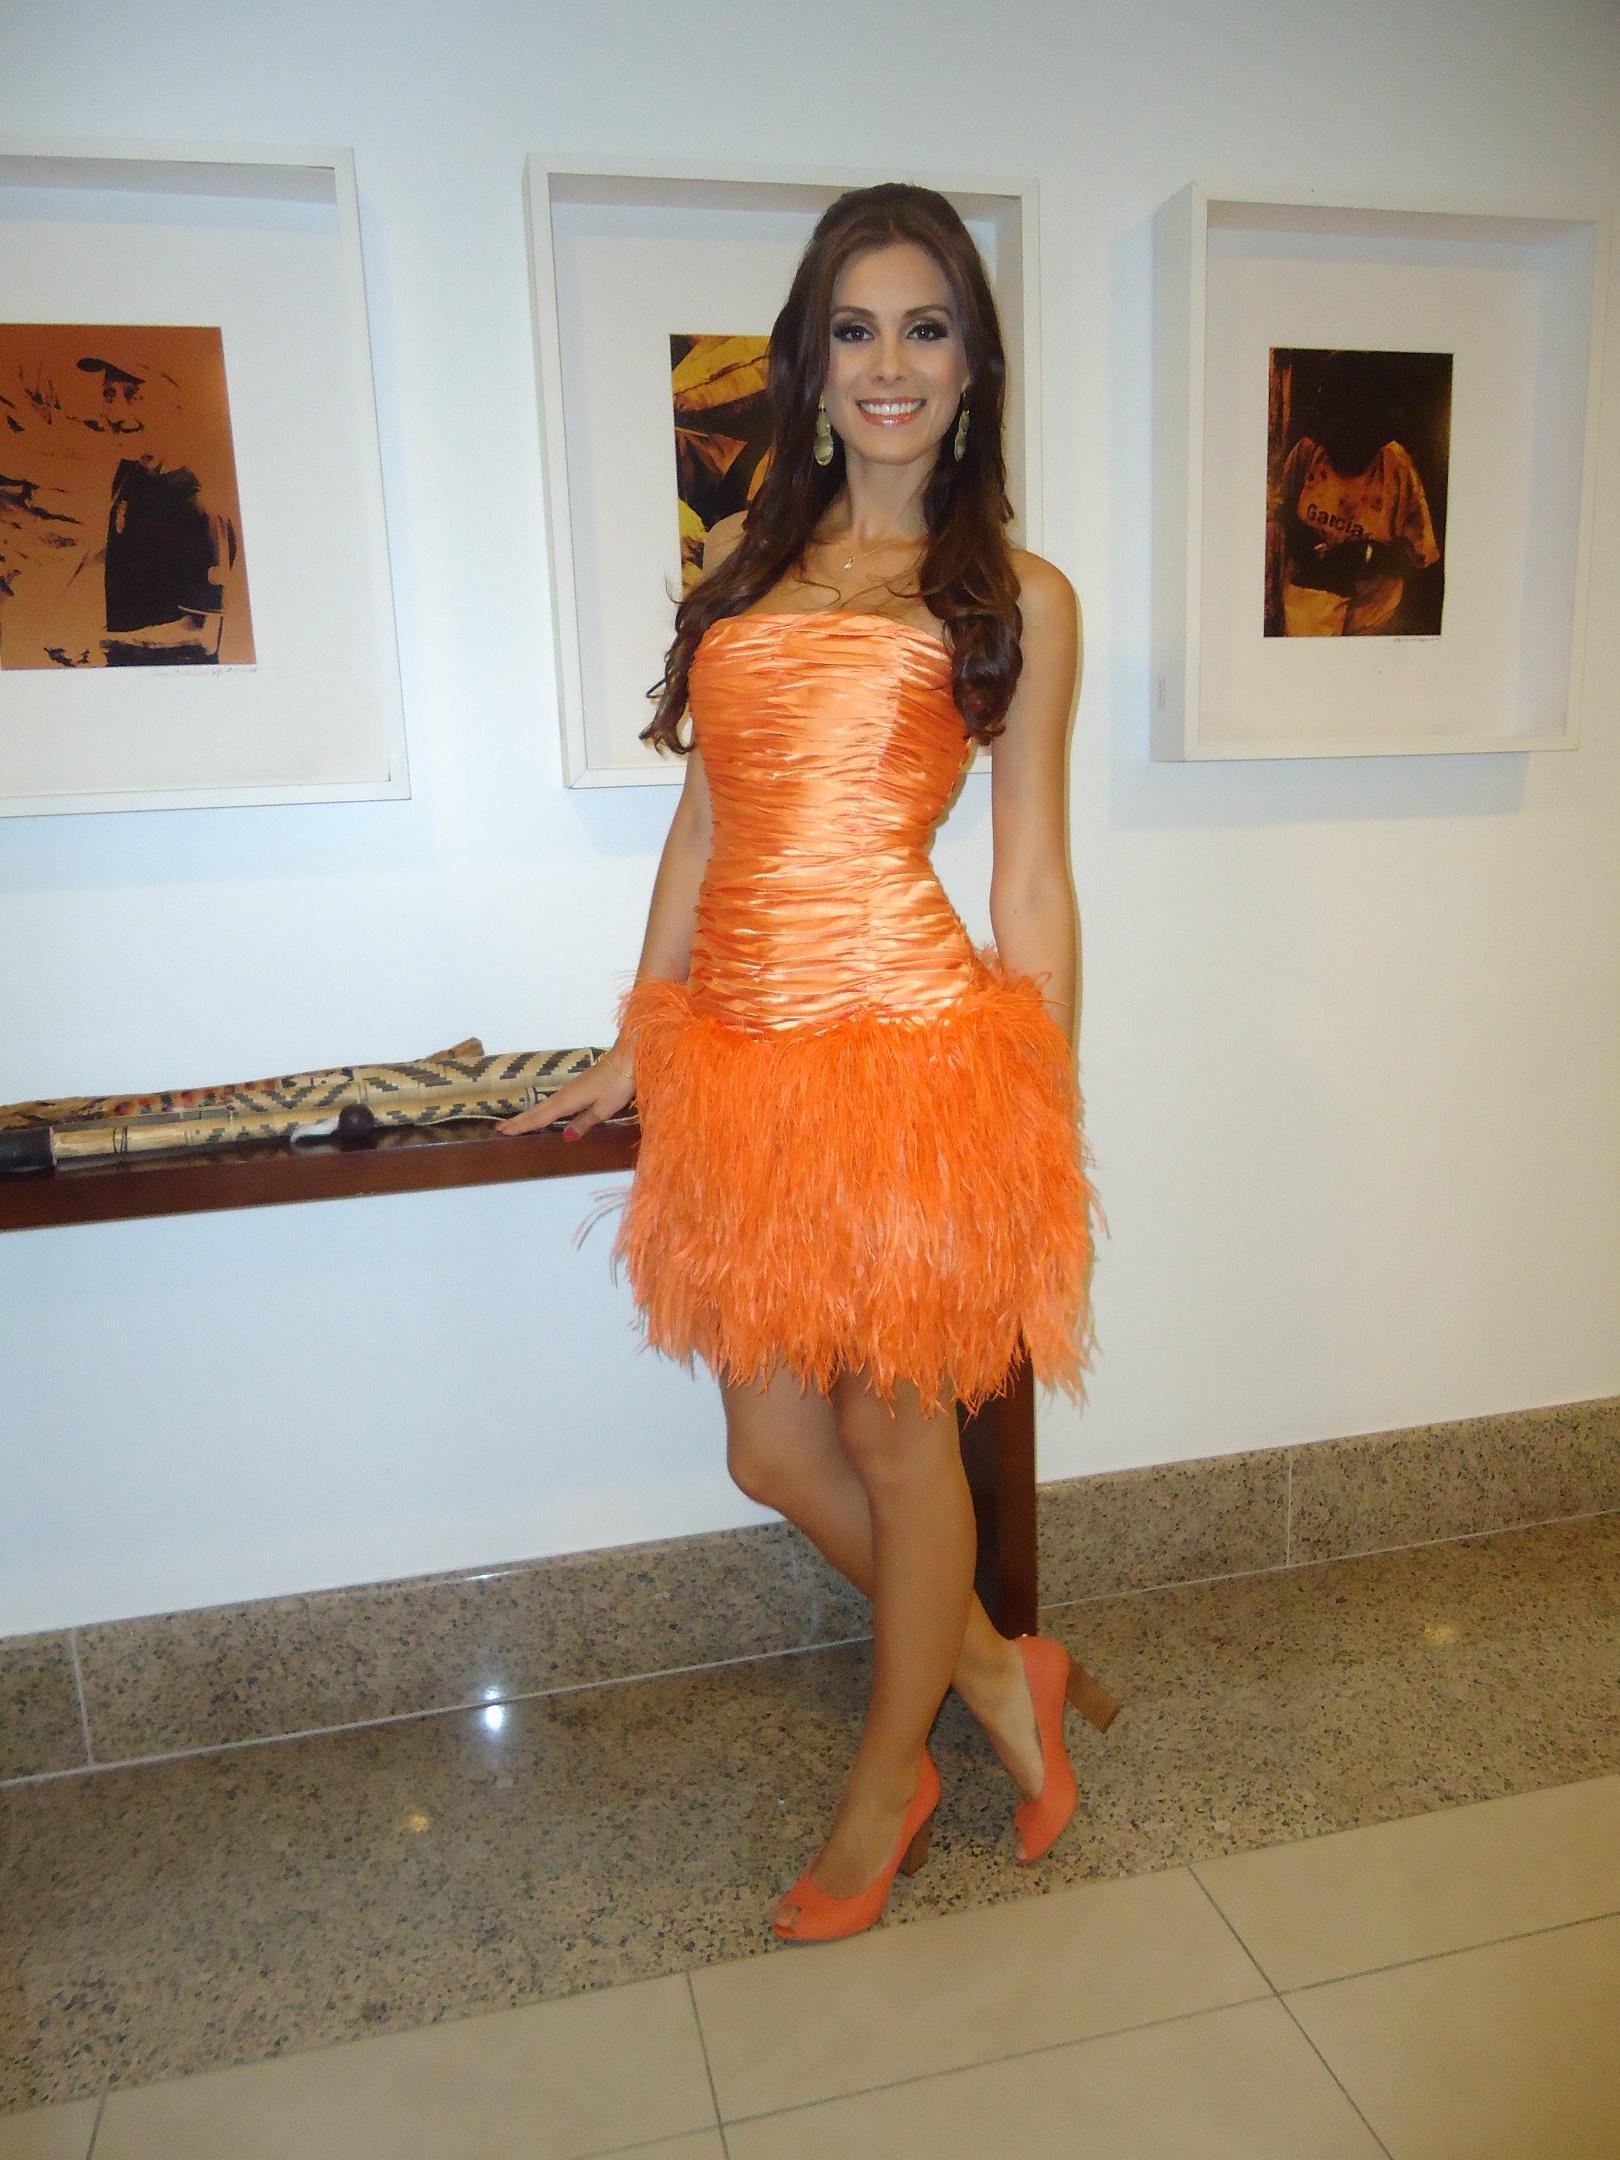 gabriela markus, miss brasil 2012. - Página 5 R48jsiez